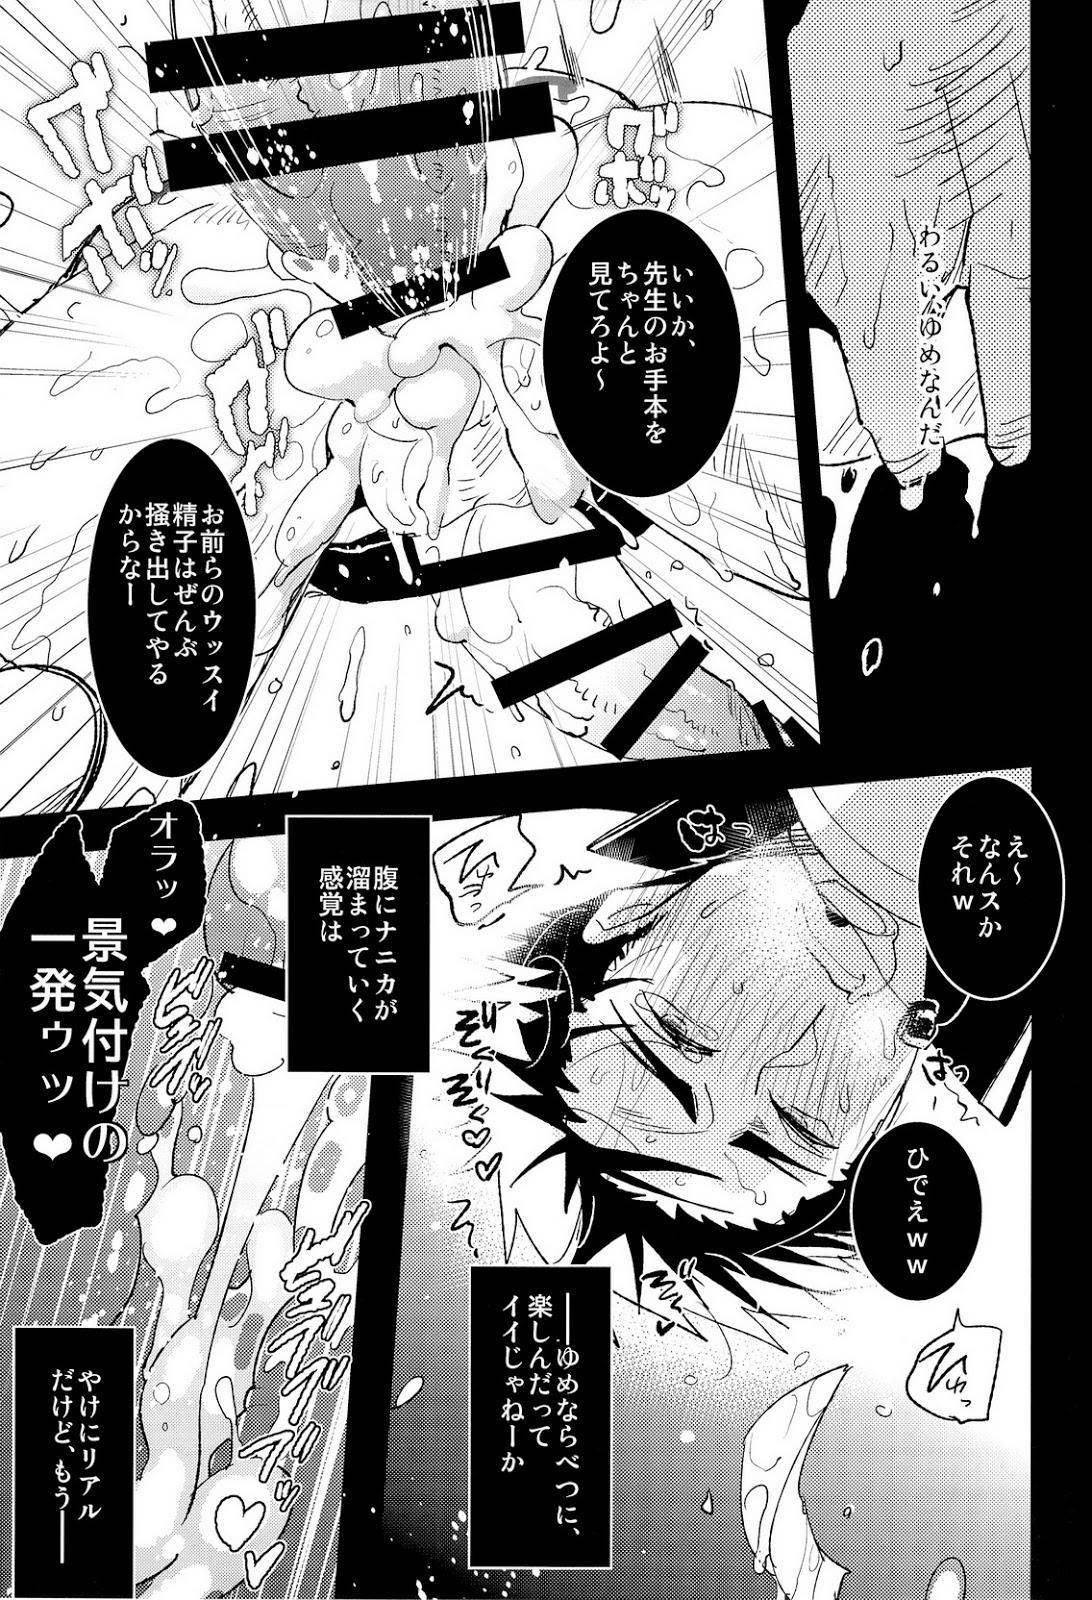 Kabejiri Hon - DK Fuck 24